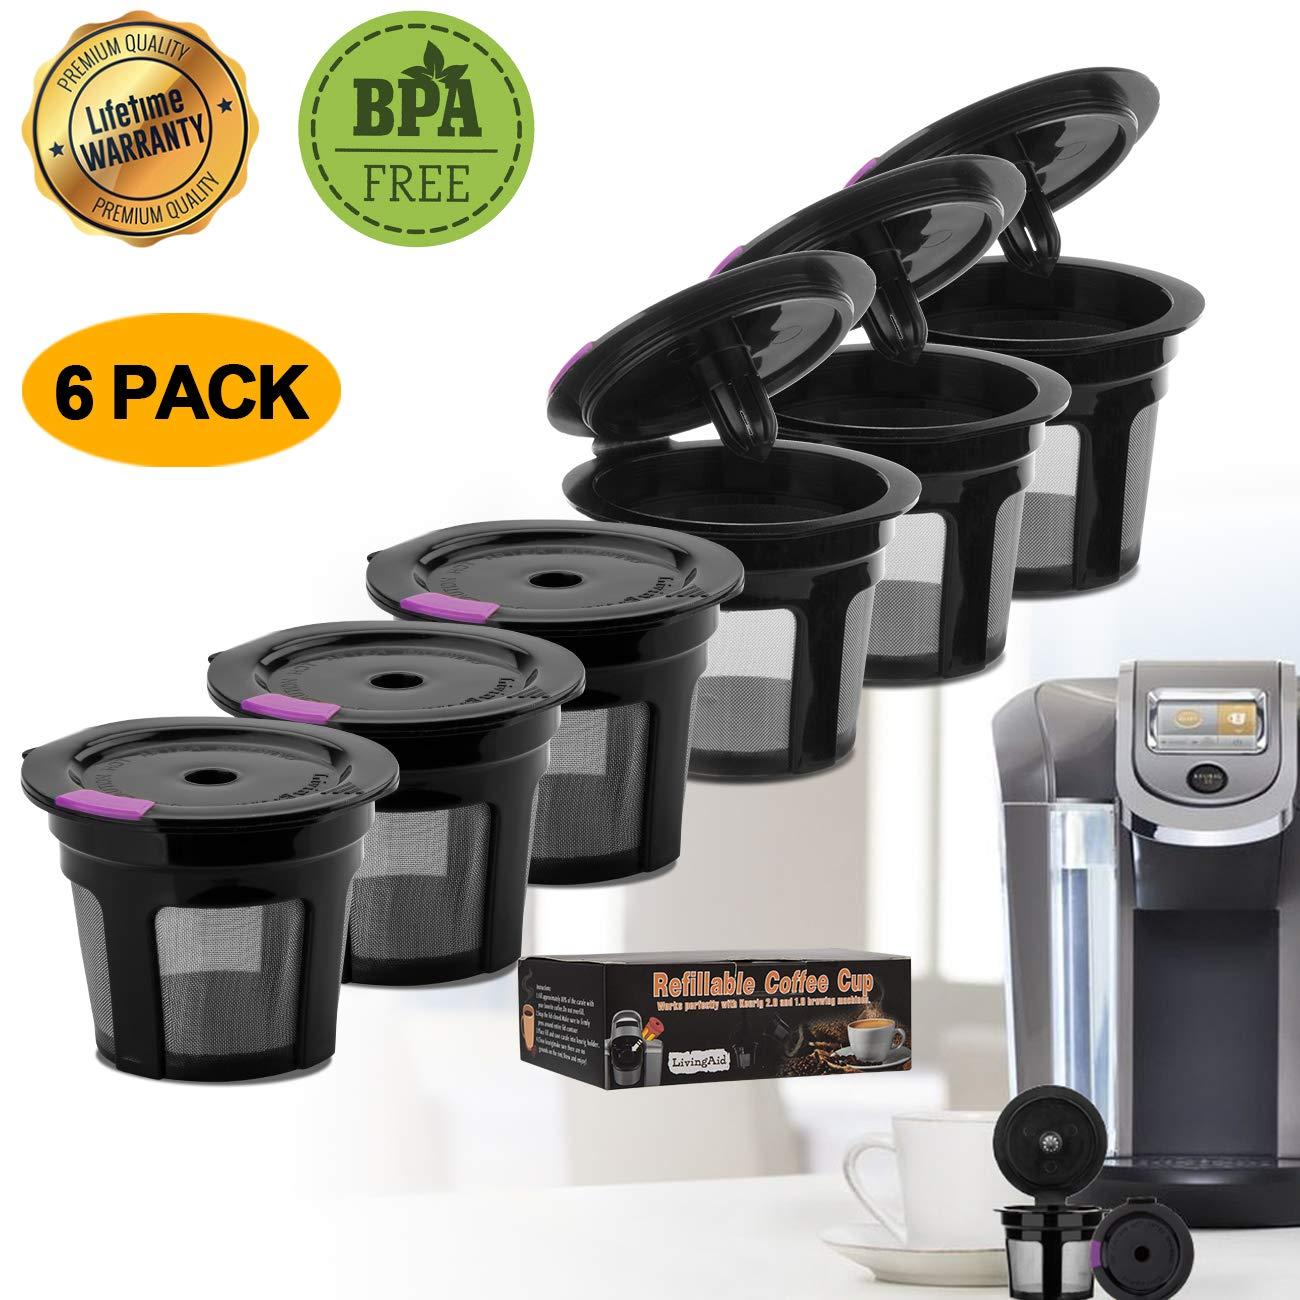 LivingAid 再利用可能 Kカップ コーヒー Kカップ 再利用可能 コーヒーポッドフィルター Keurig Brewers 1.0 または 2.0 Machine BPAフリー (ブラック) 6個パック   B07PQFGDTL